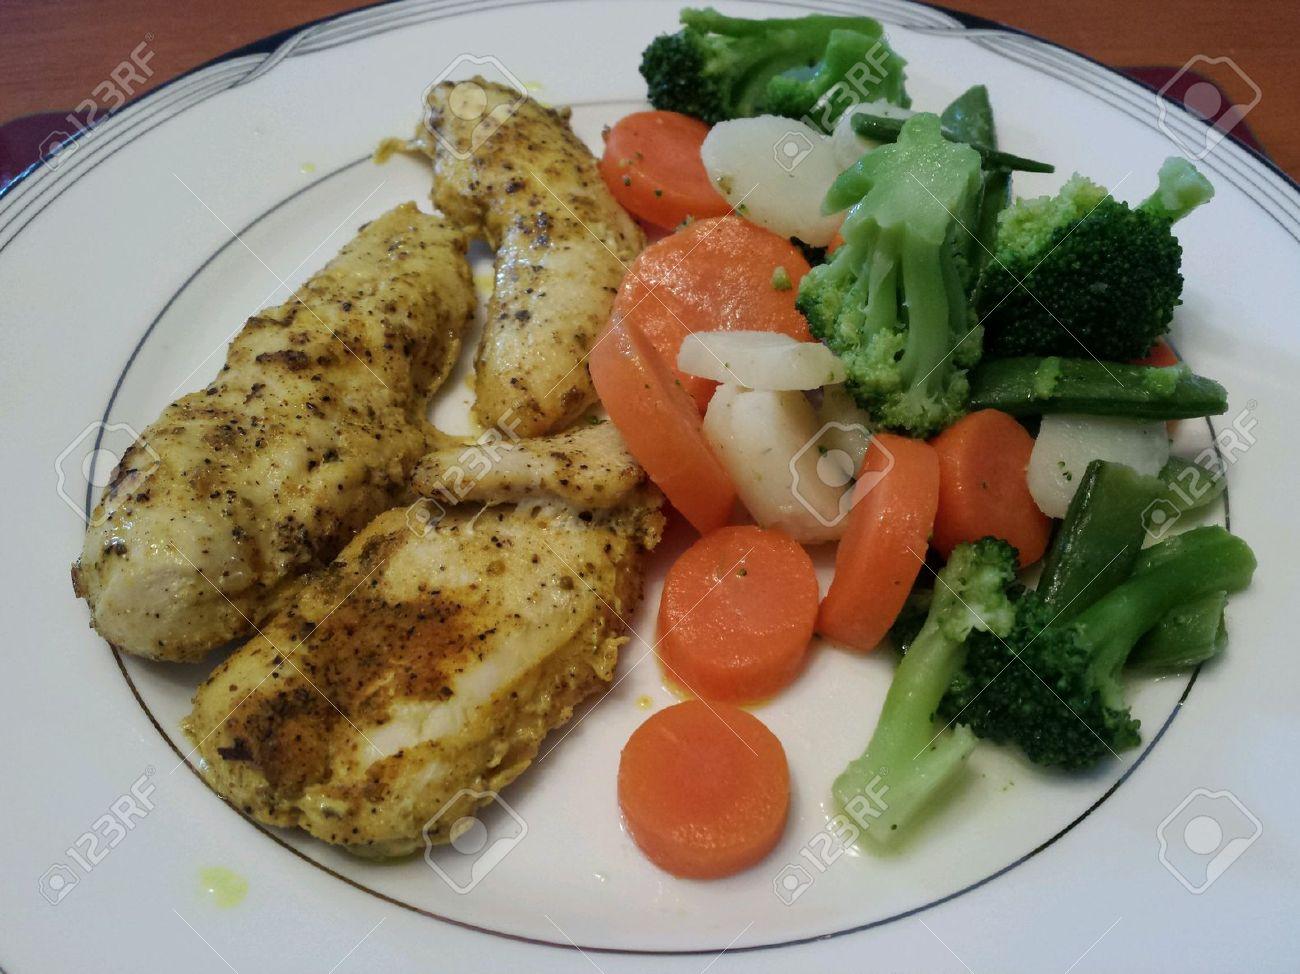 Healthy Dinner Plate Of Baked Herb Seasoned Boneless Organic Chicken Strips With Various Vegetable